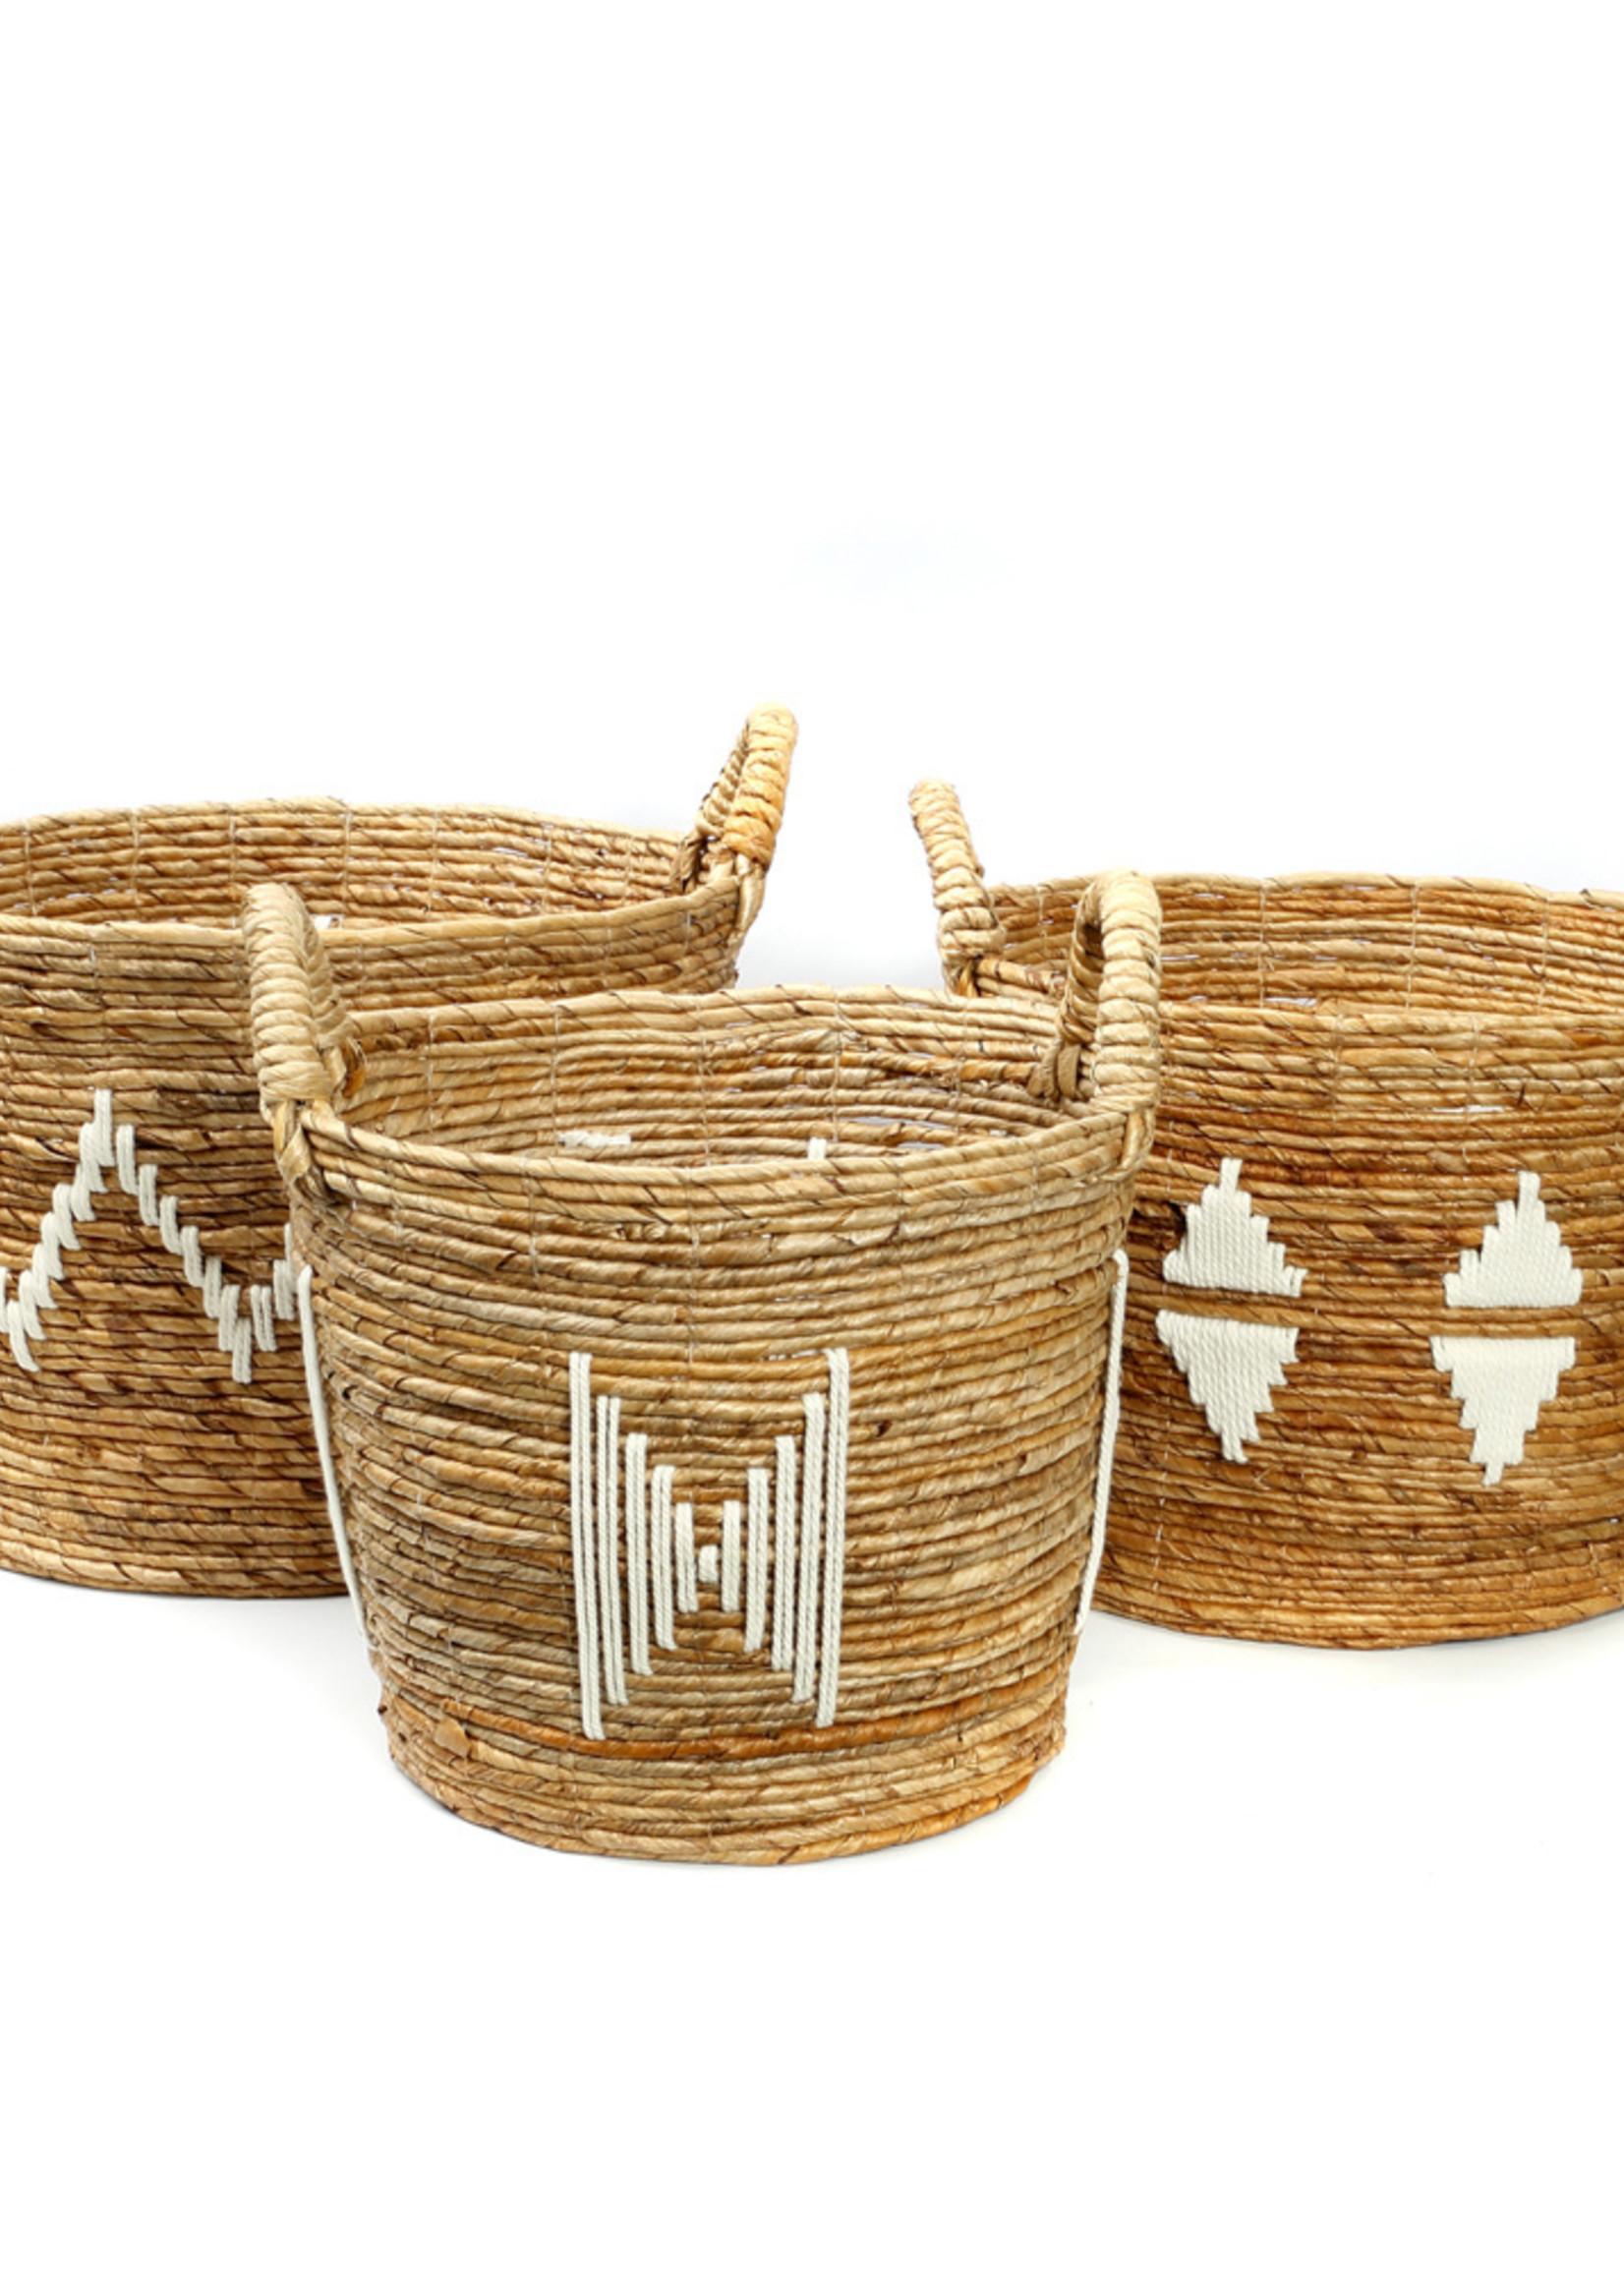 The Banana Stitched Baskets - Natural White - SET3